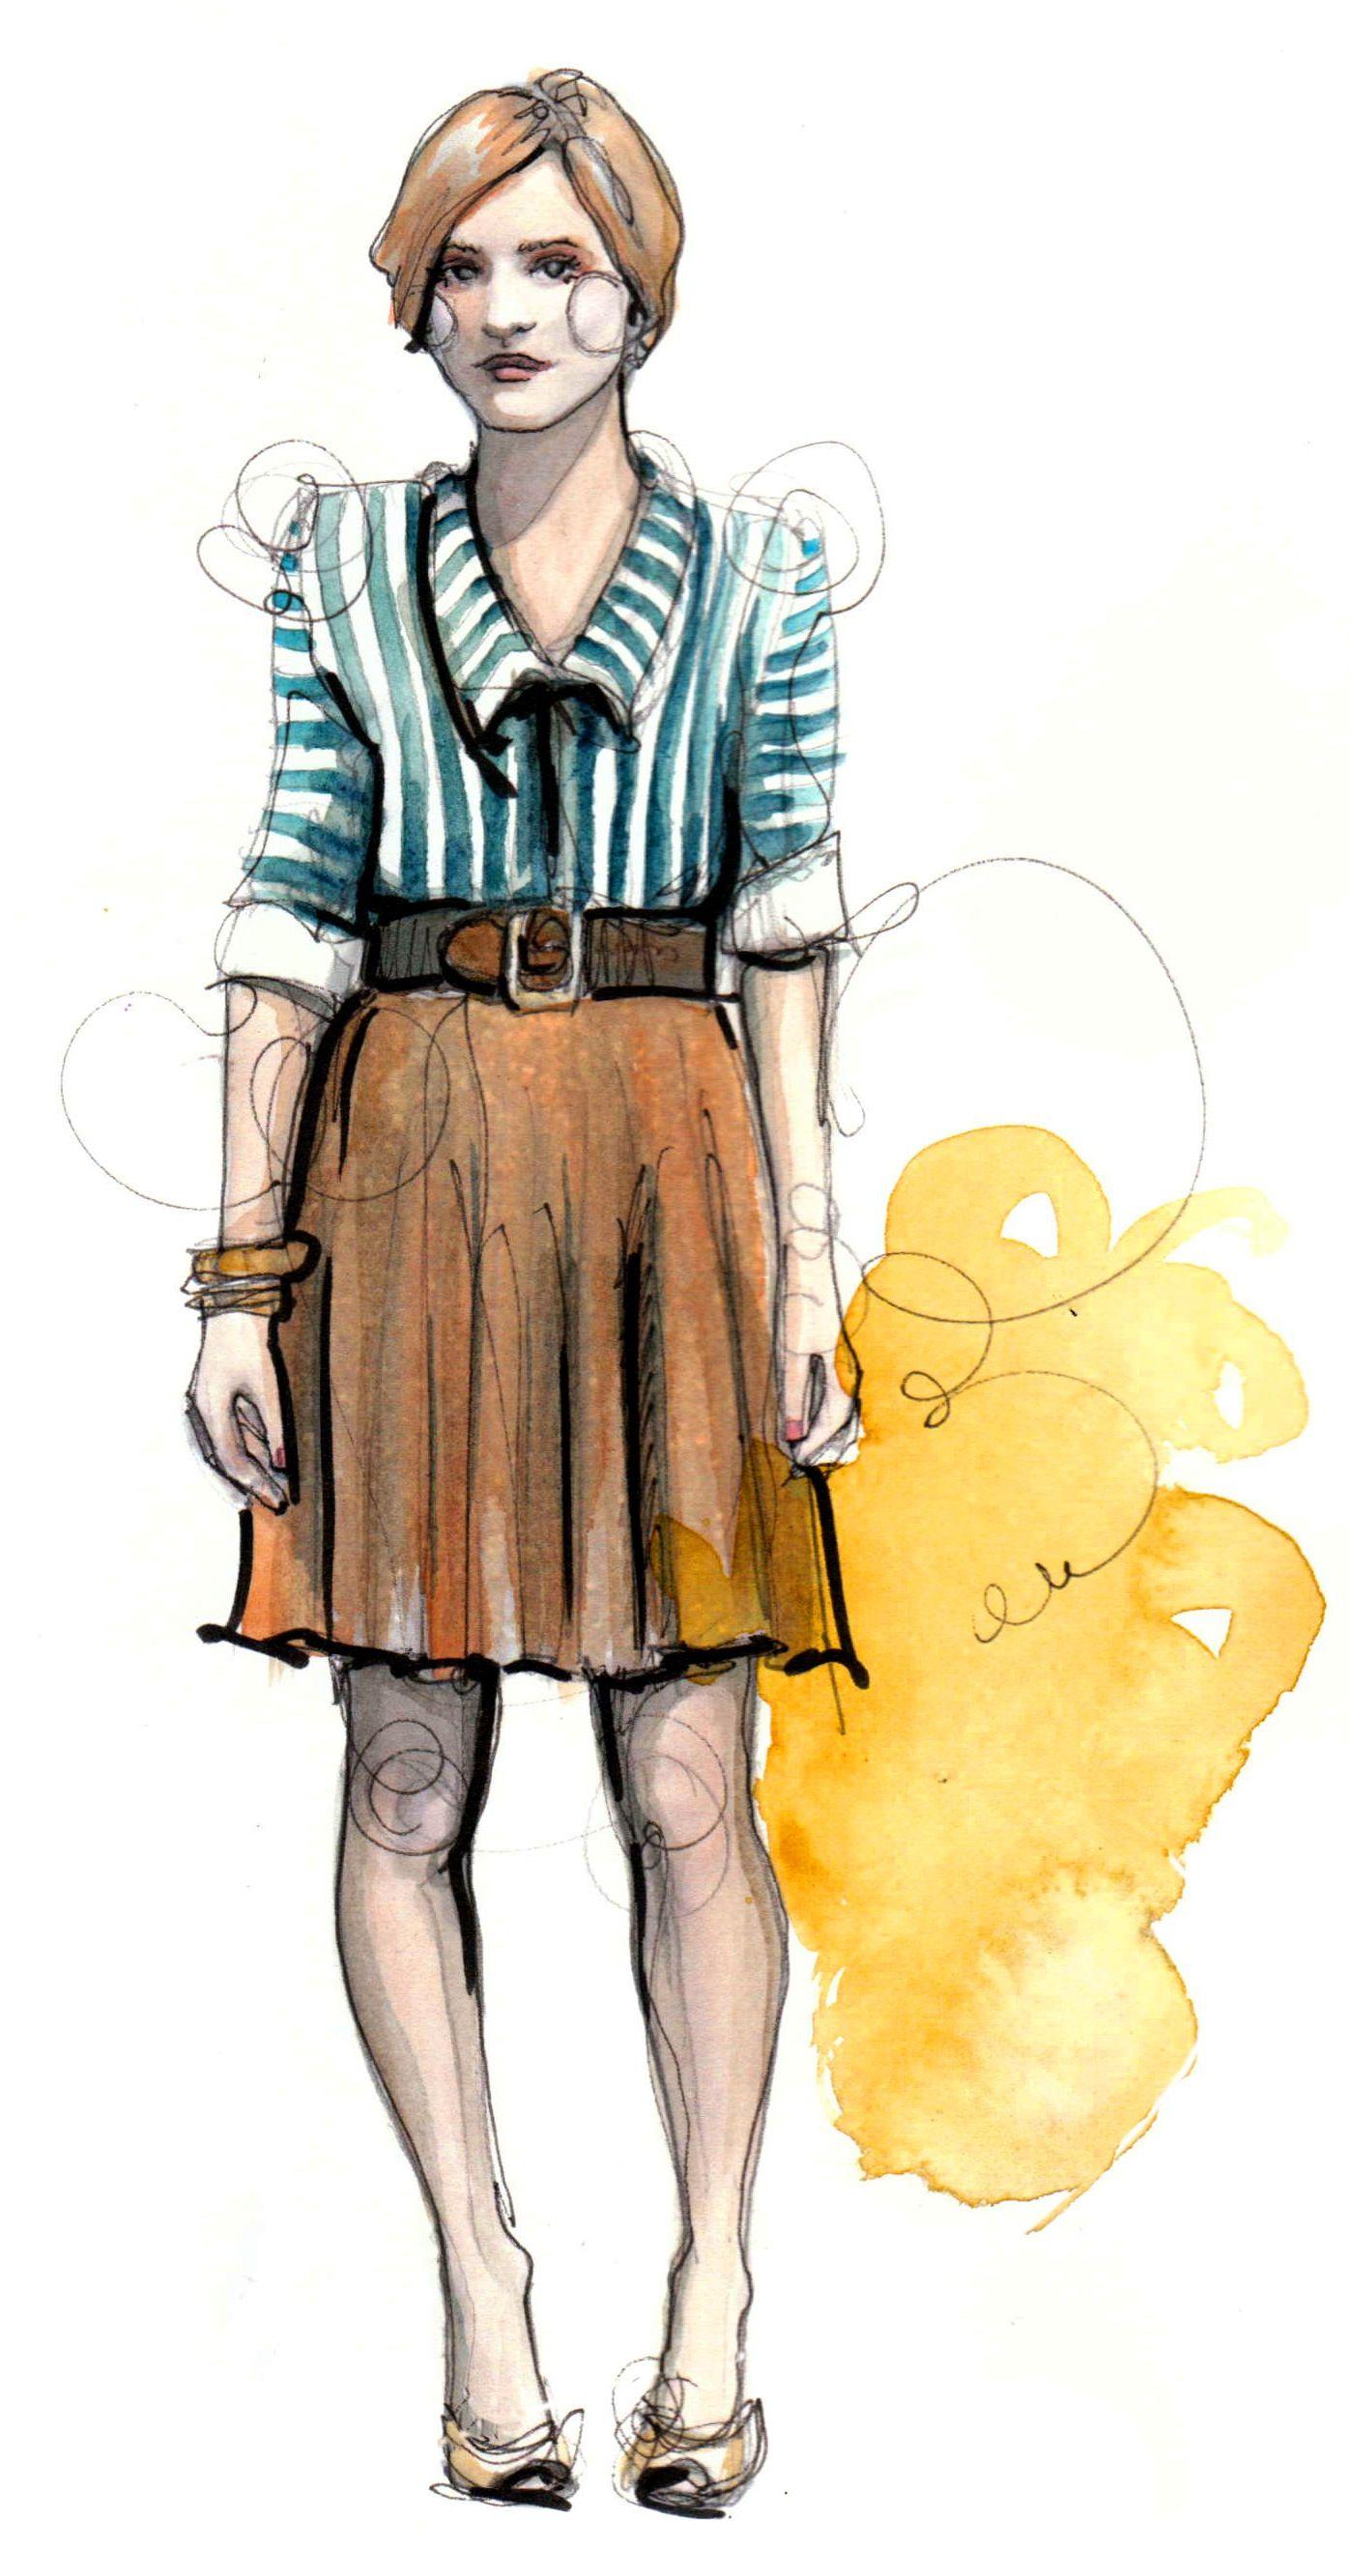 Poppytalk glorious fashion illustration from Katie Rodgers aka